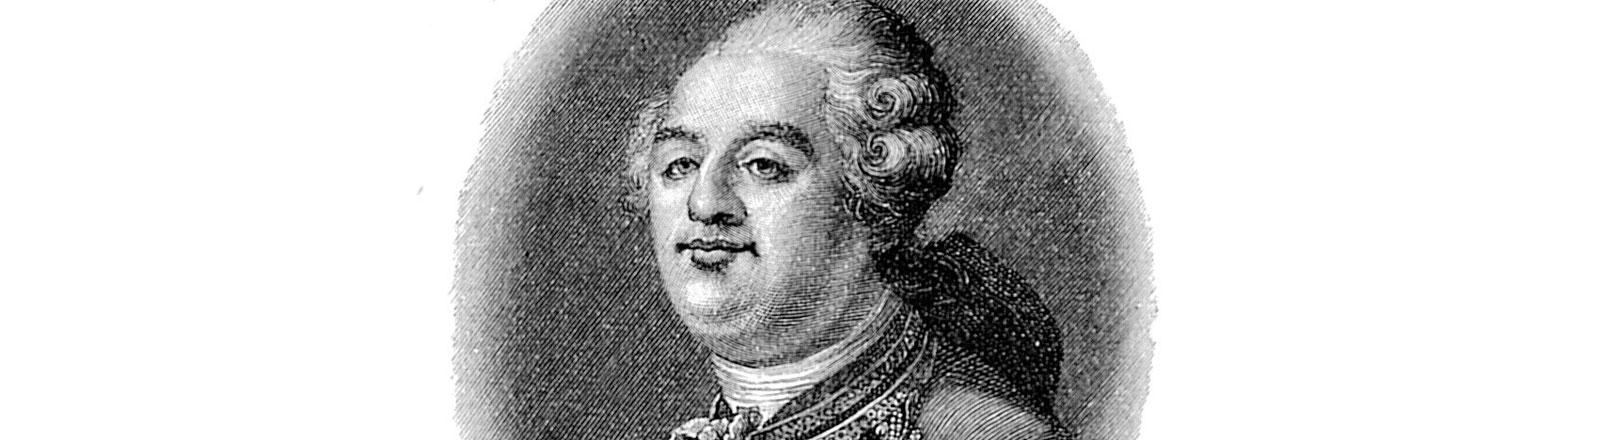 König Ludwig XVI.